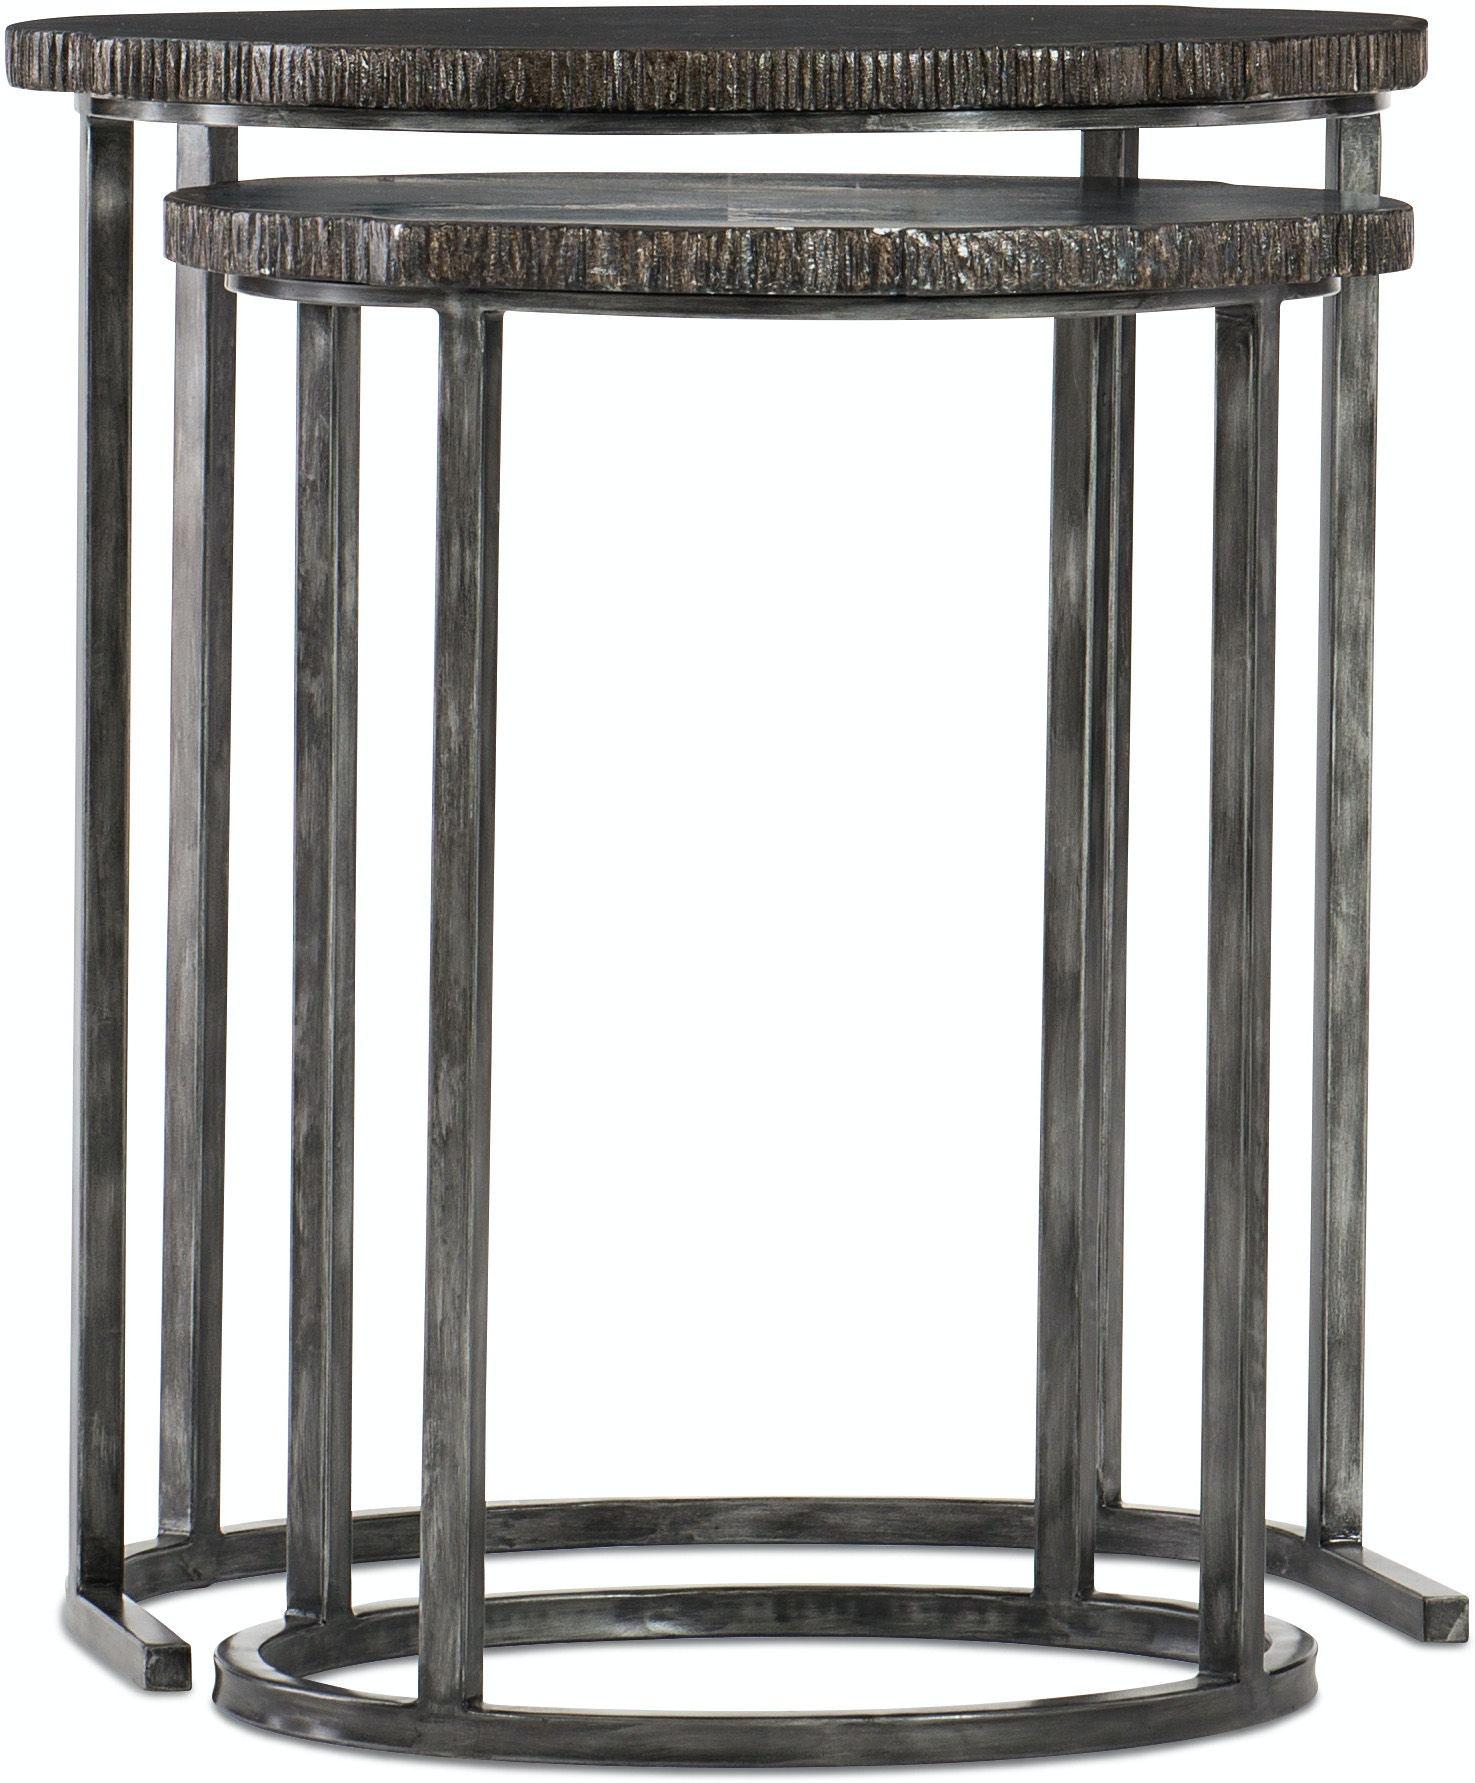 Hooker Furniture Living Room Nesting Tables 500-50-949-DKW